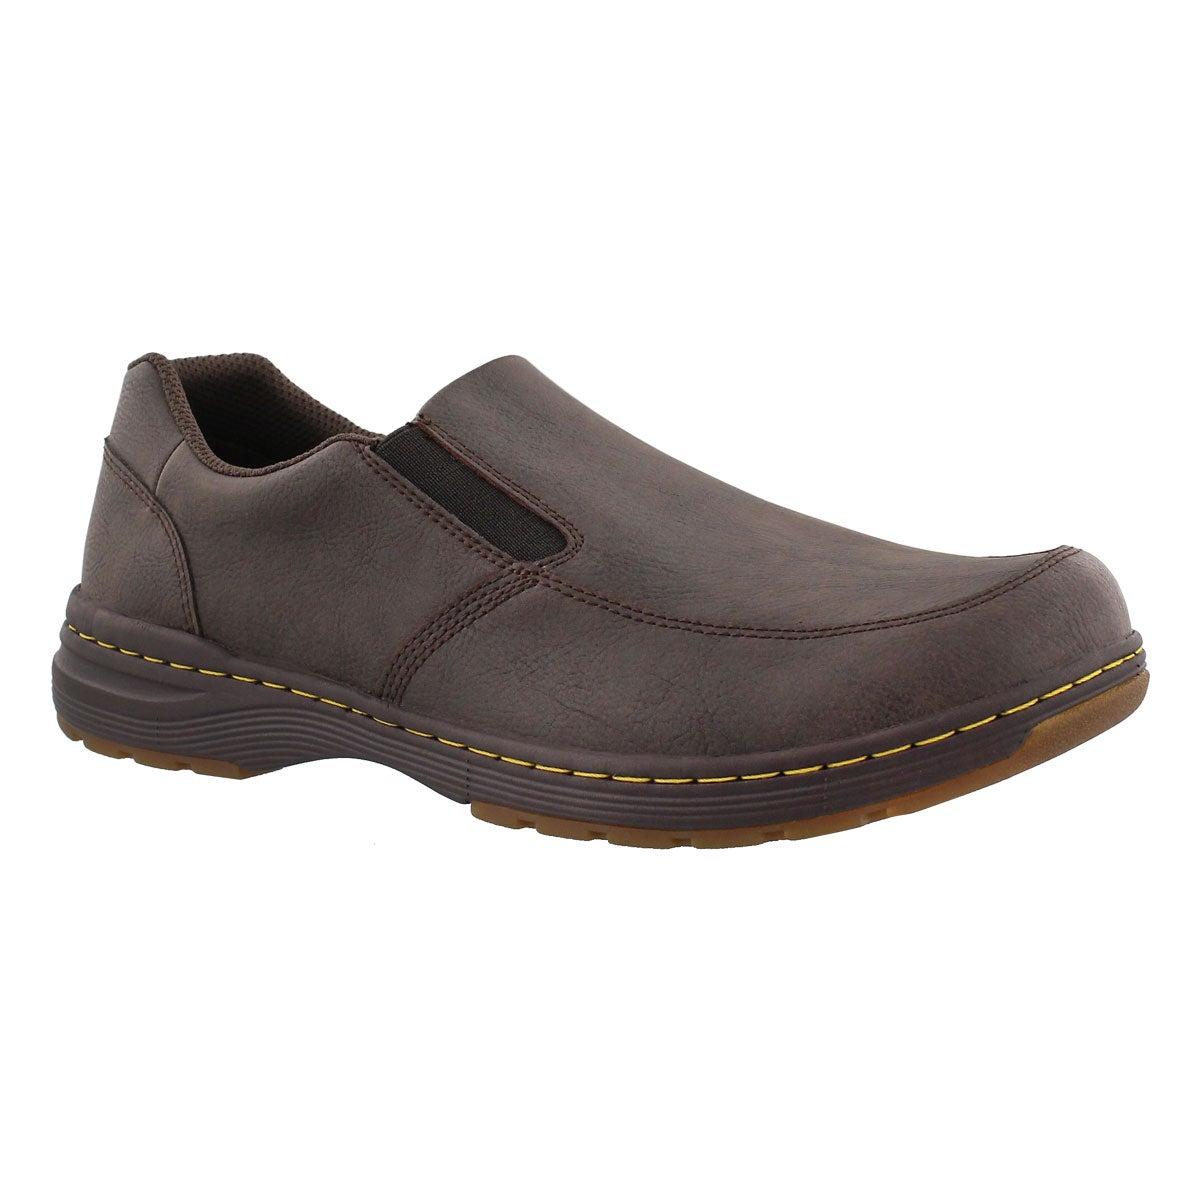 Men's BRENNAN brown slip on casual shoes